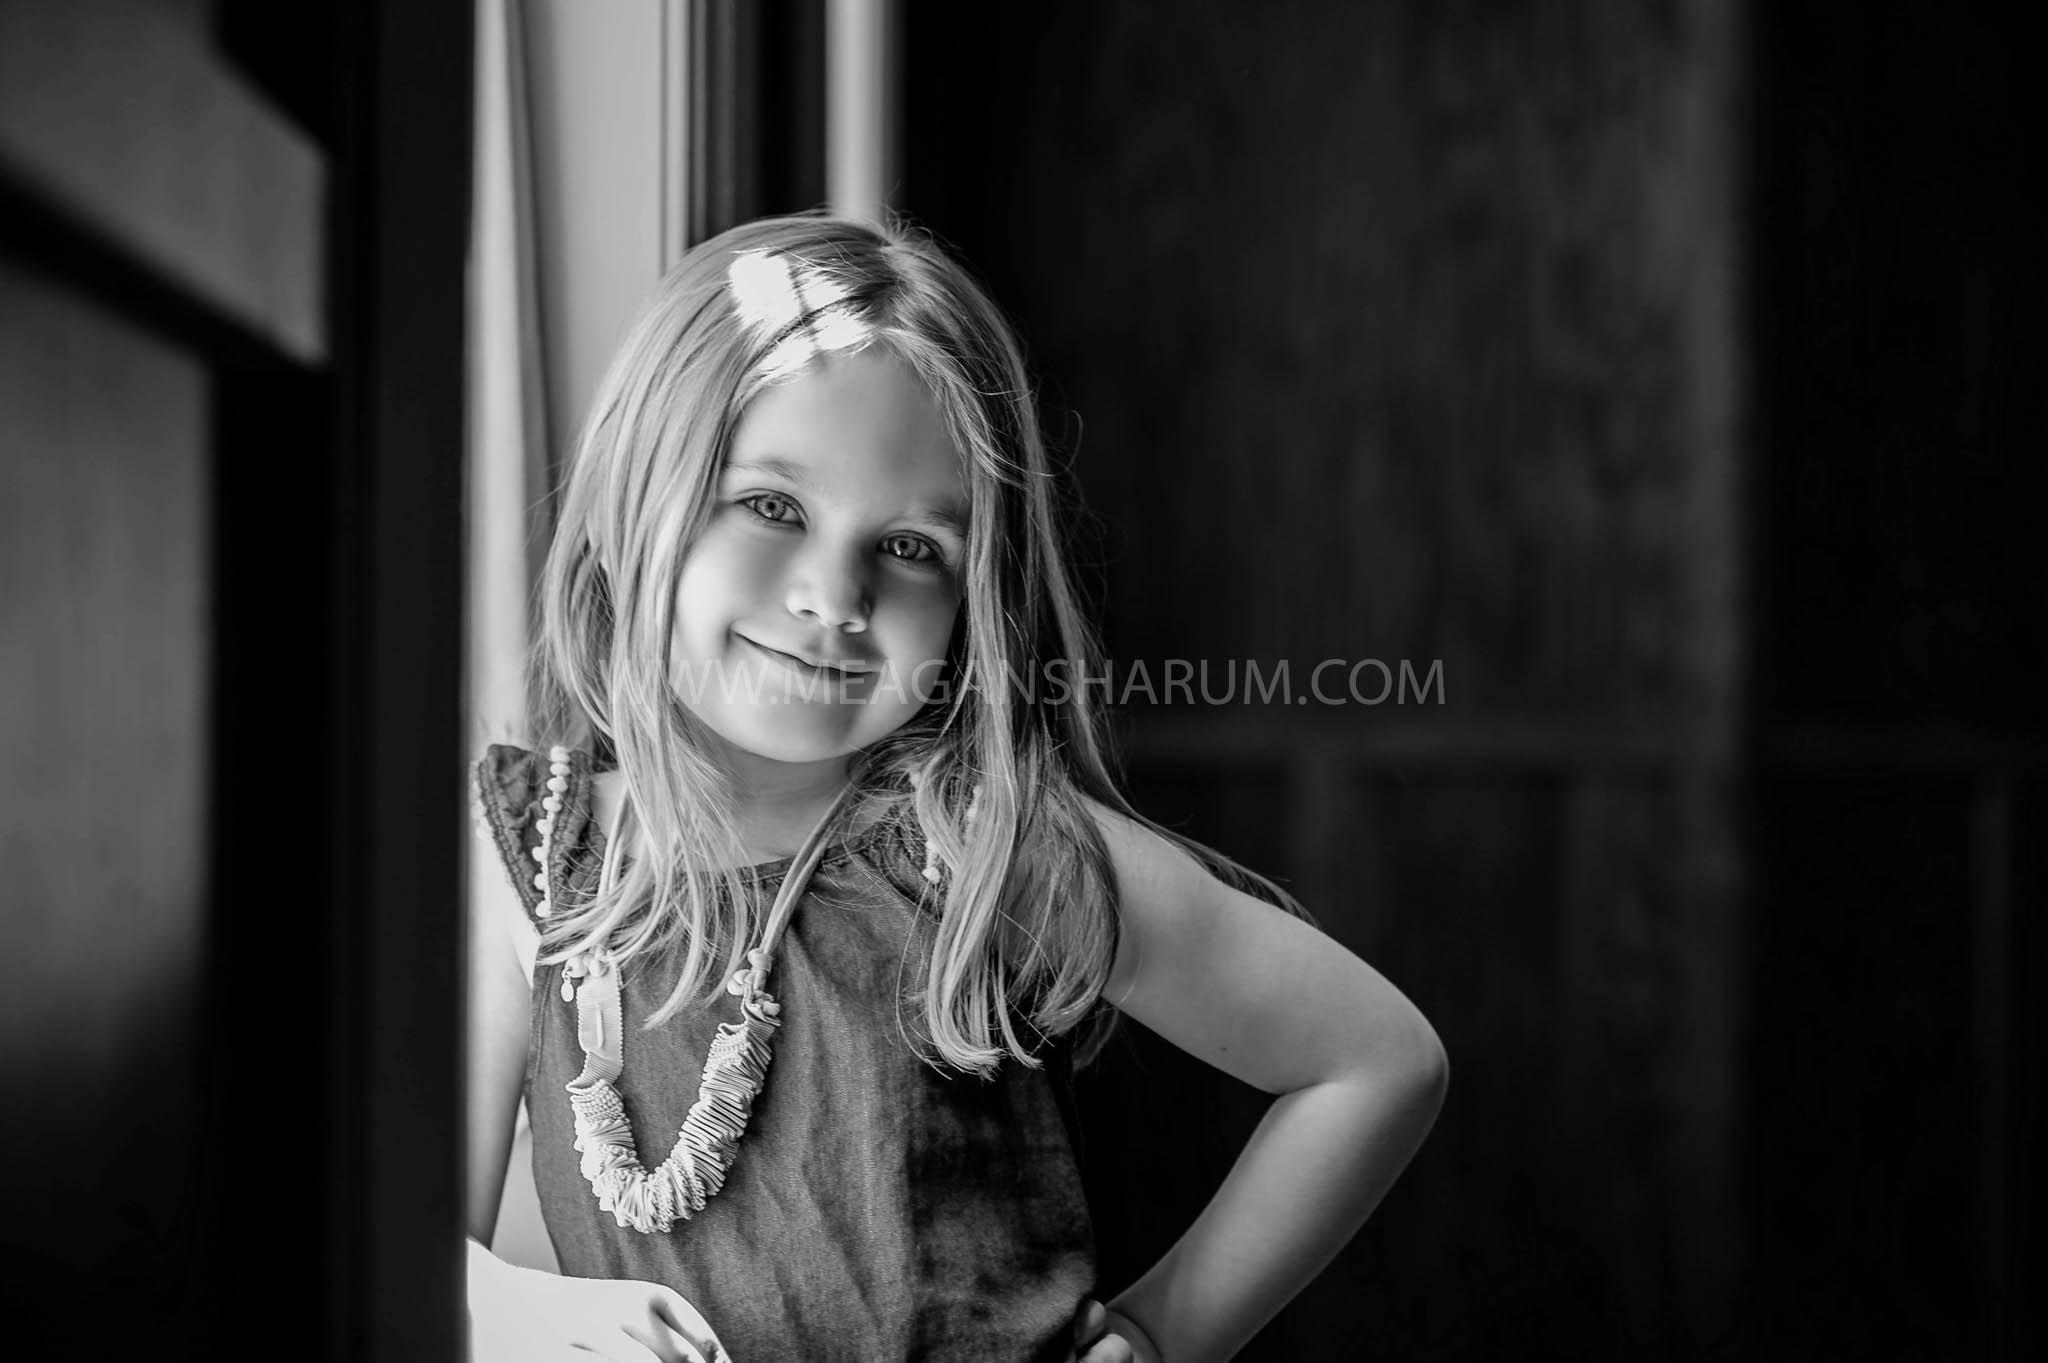 Meagansharumphotography-31.jpg